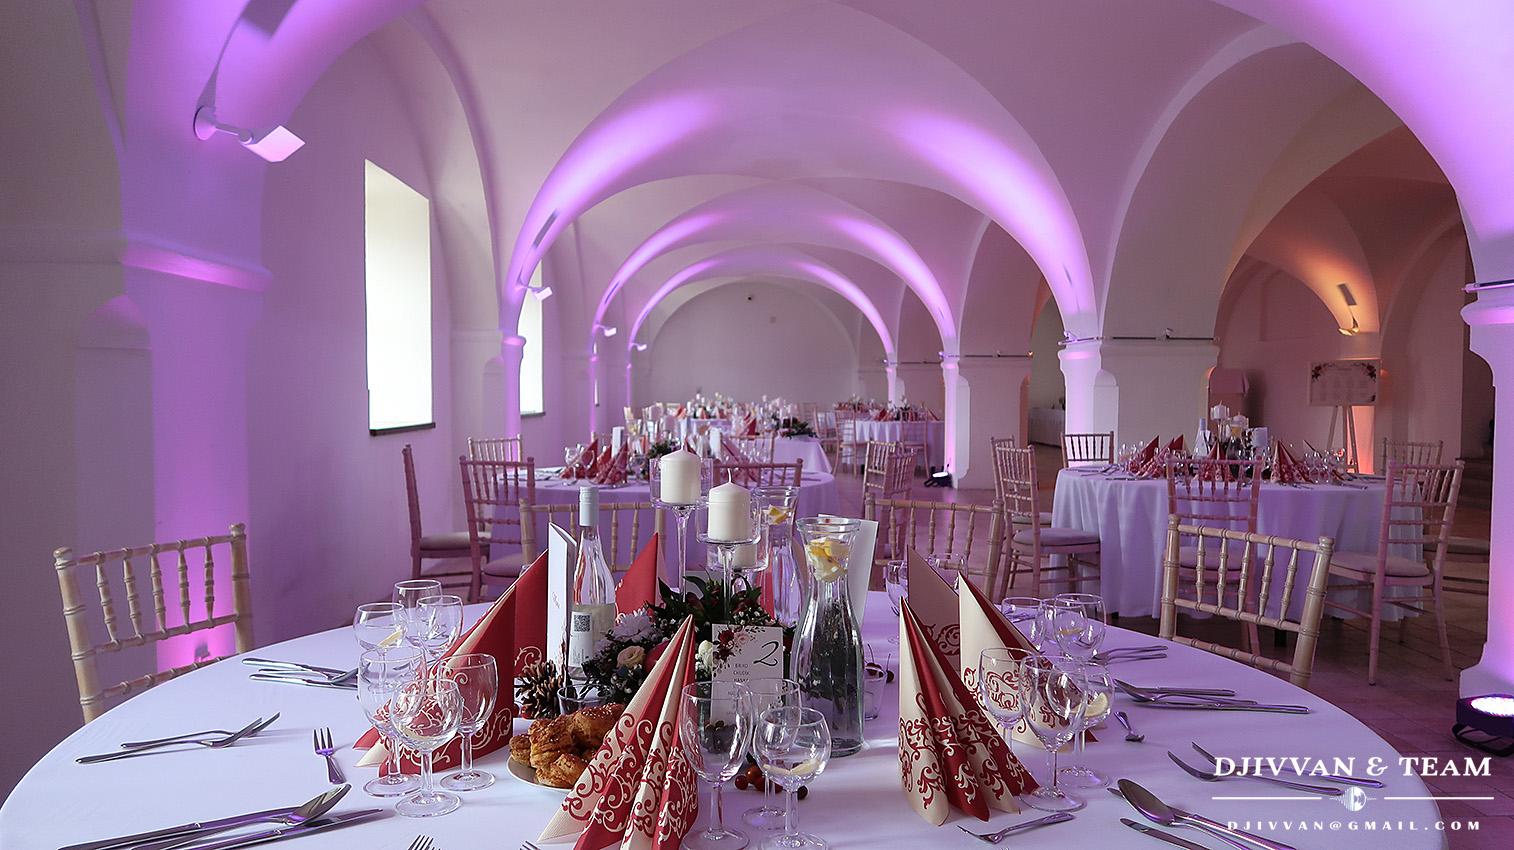 Dj na svadbu nasvietenie sály